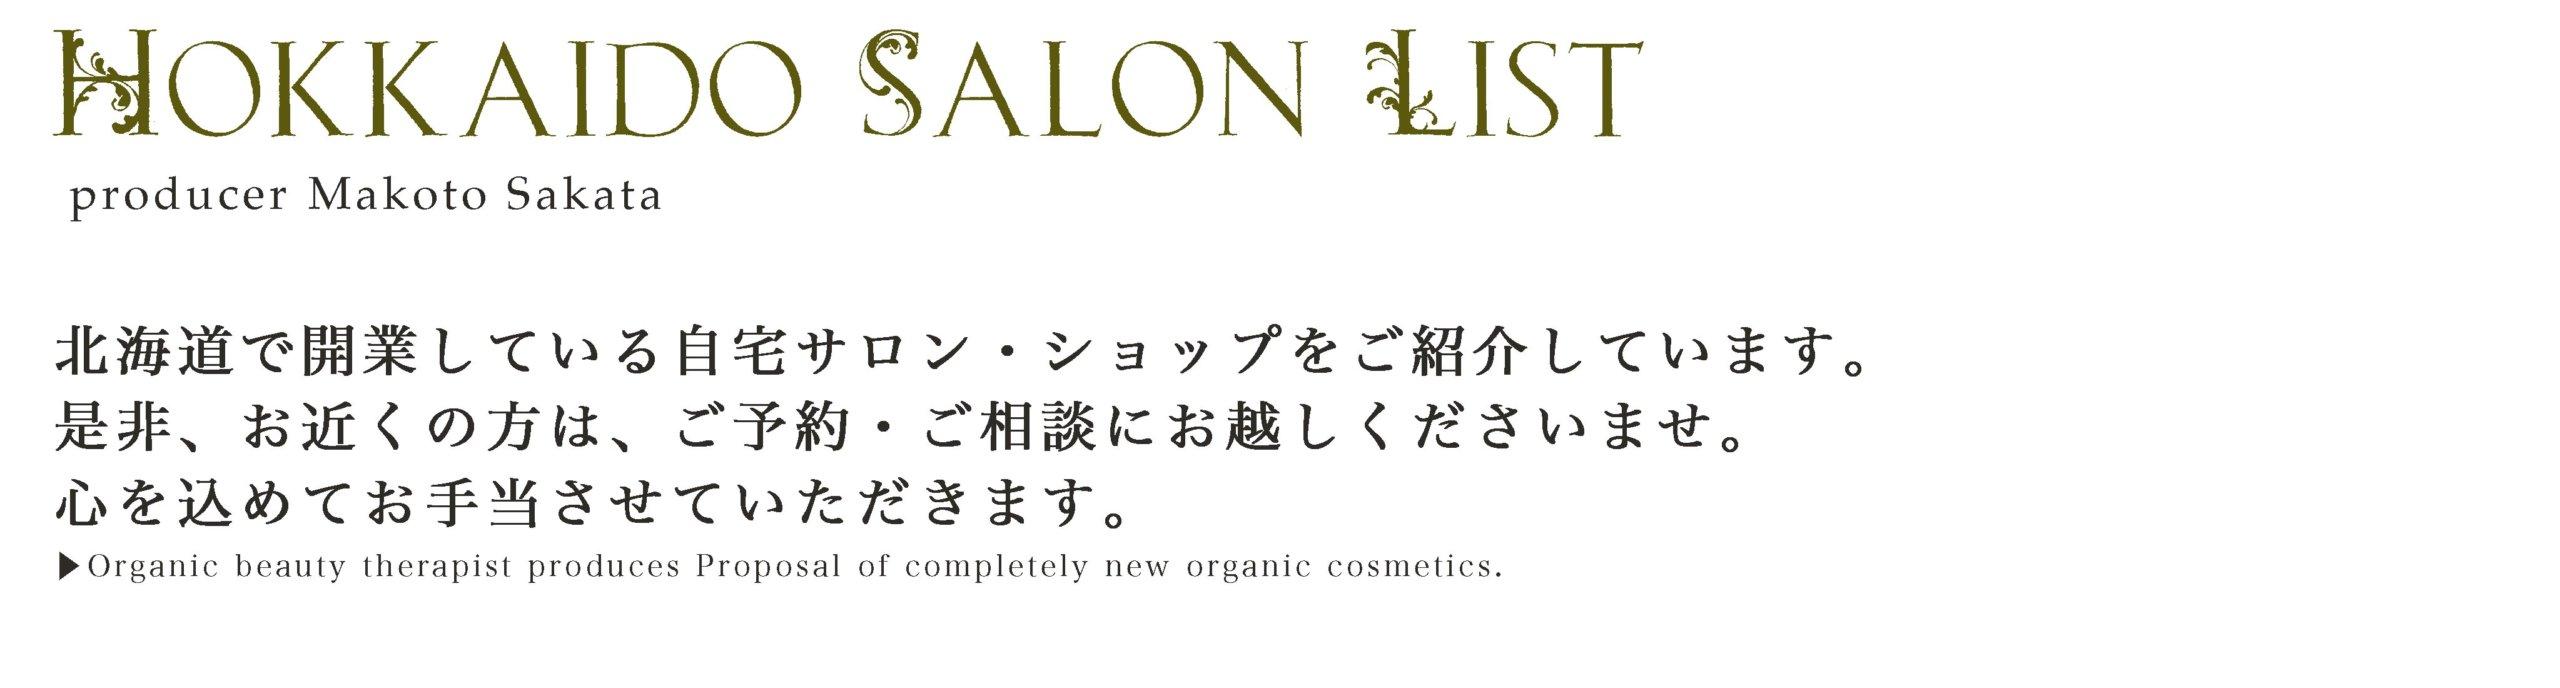 Hokkaido Salon List